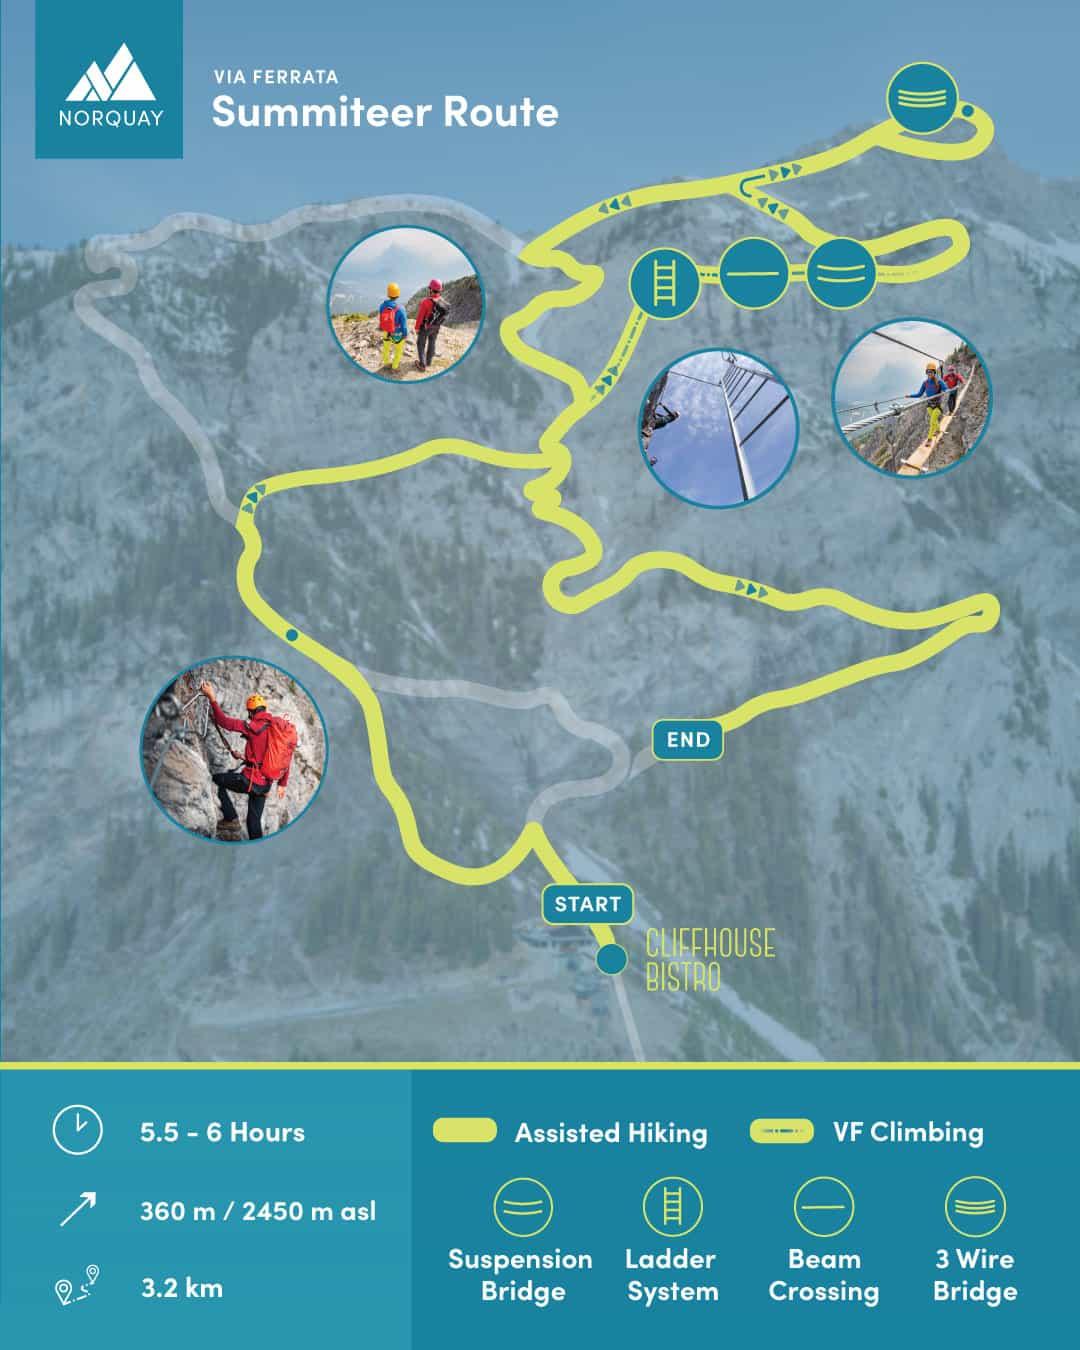 Via Ferrata Summiteer Route at Banff Mt Norquay